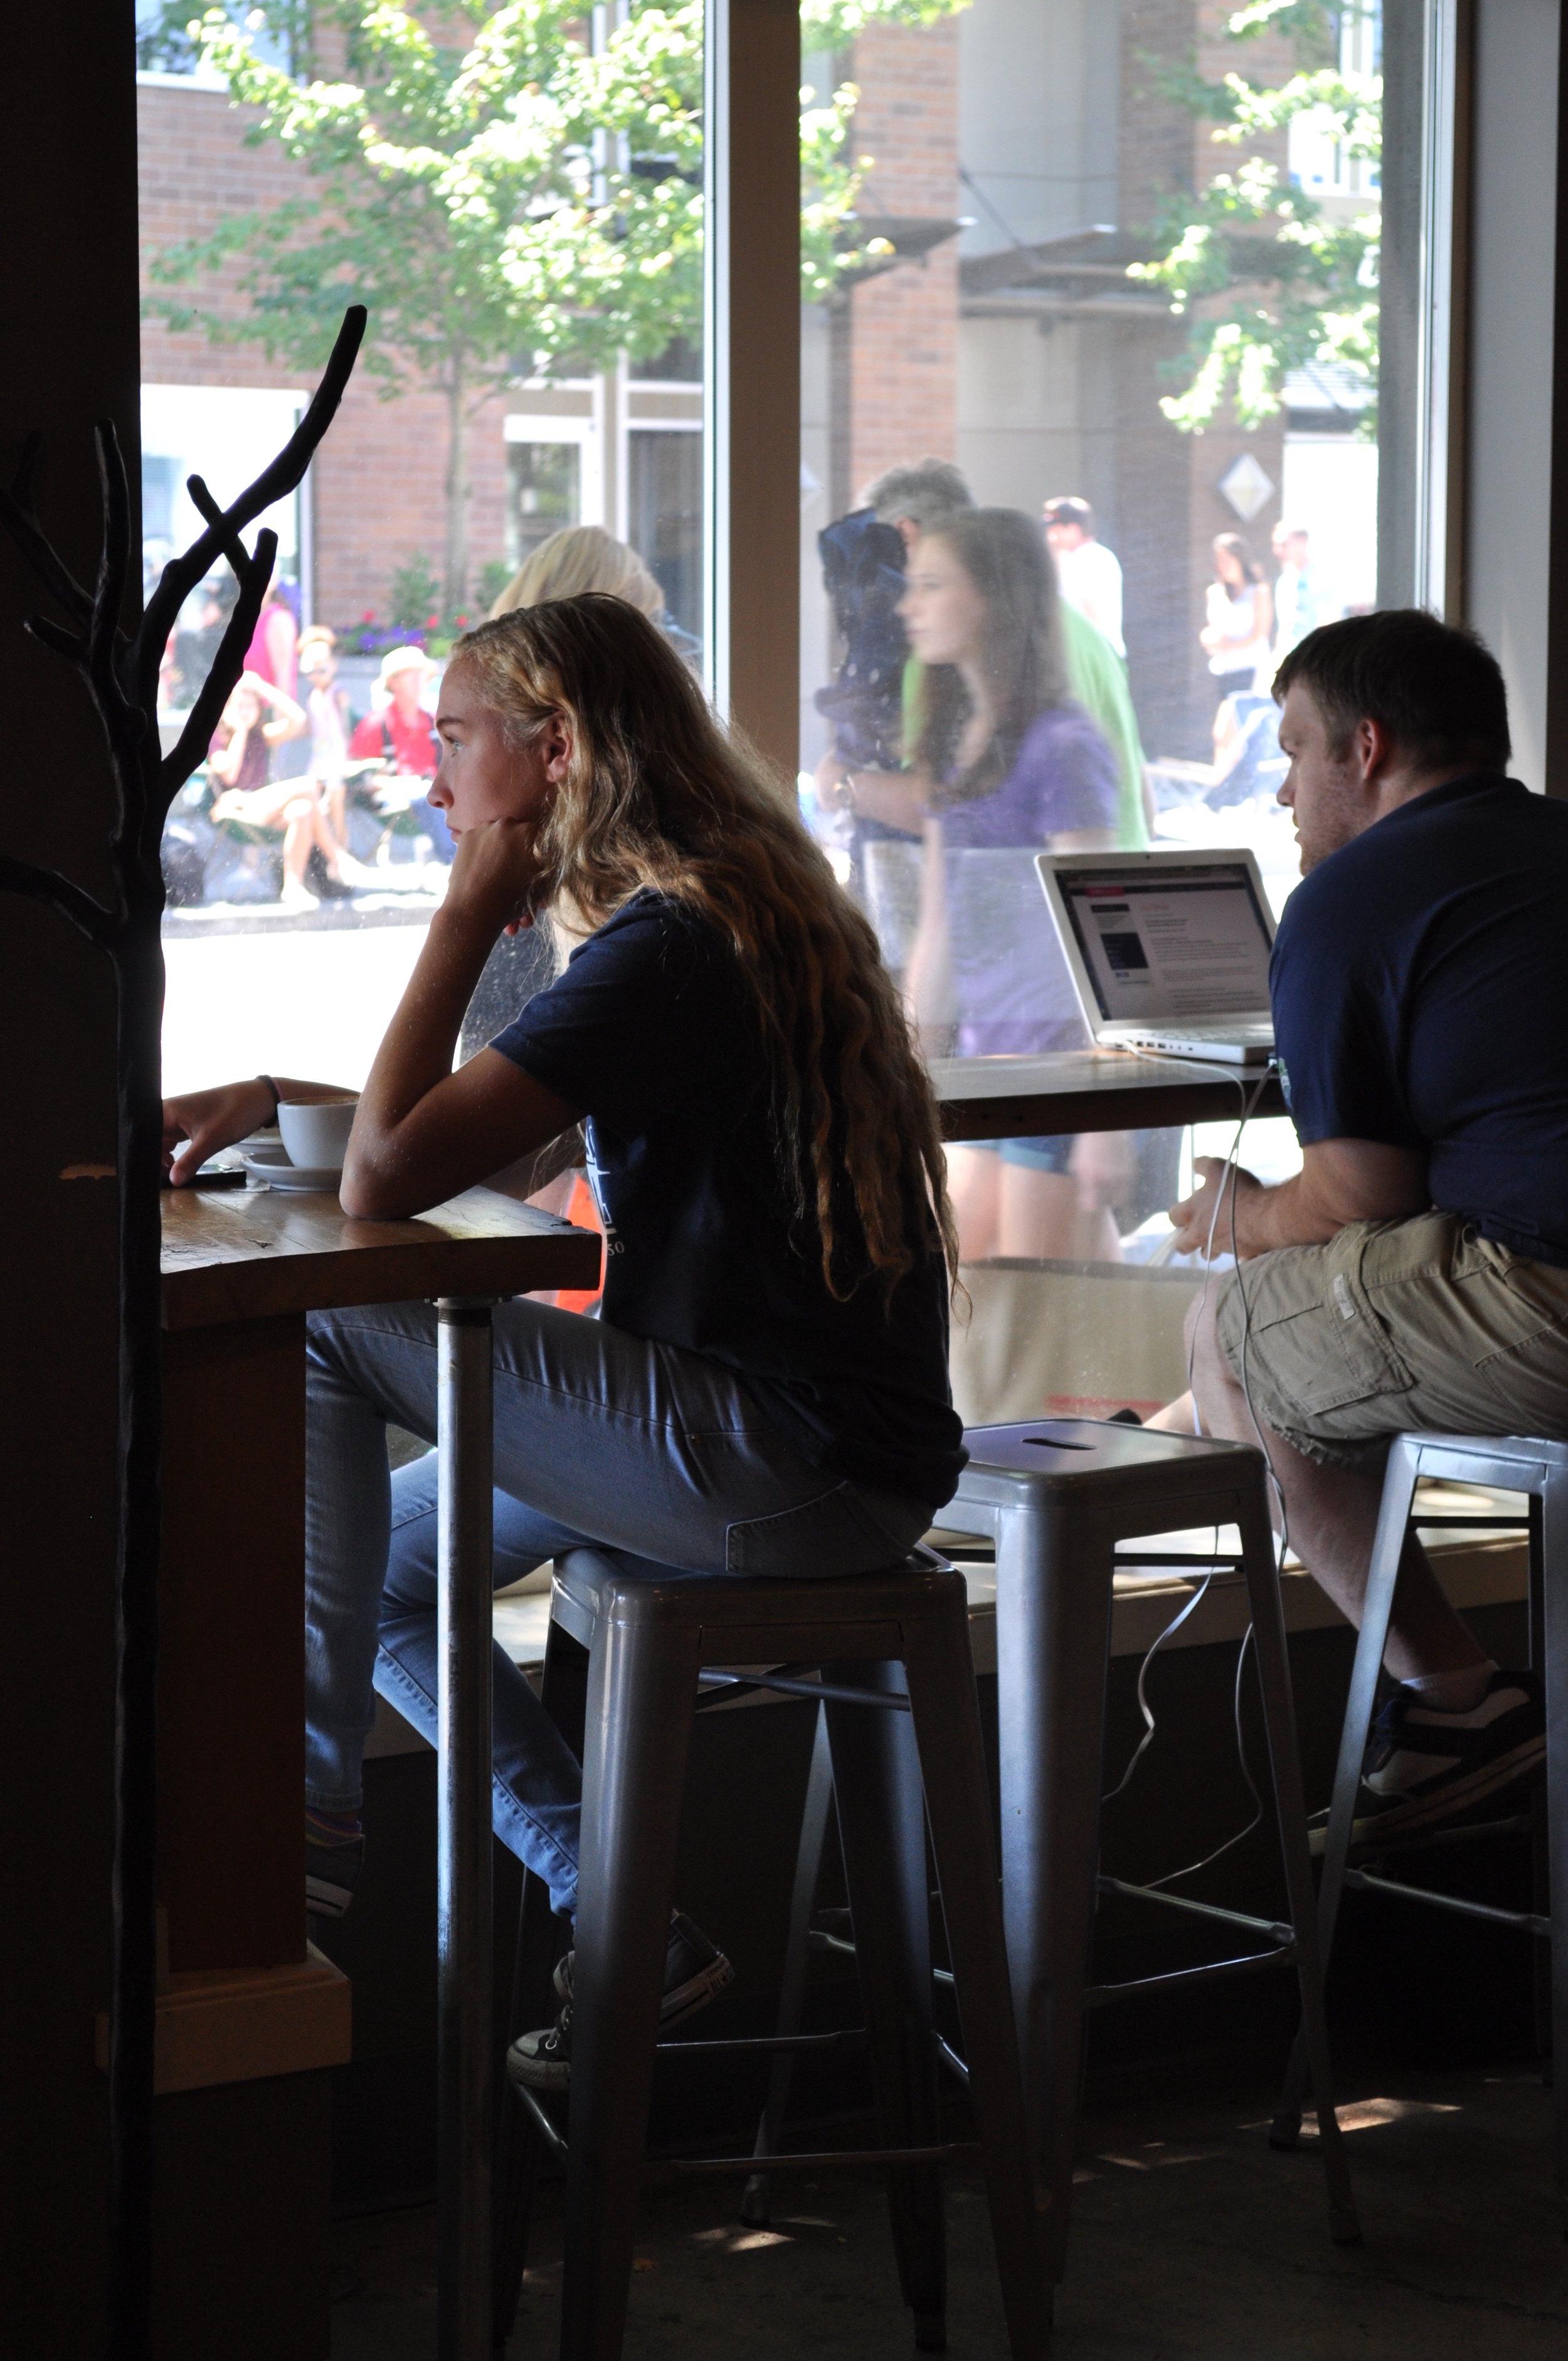 Coffee contemplation_Shannon Black.jpg